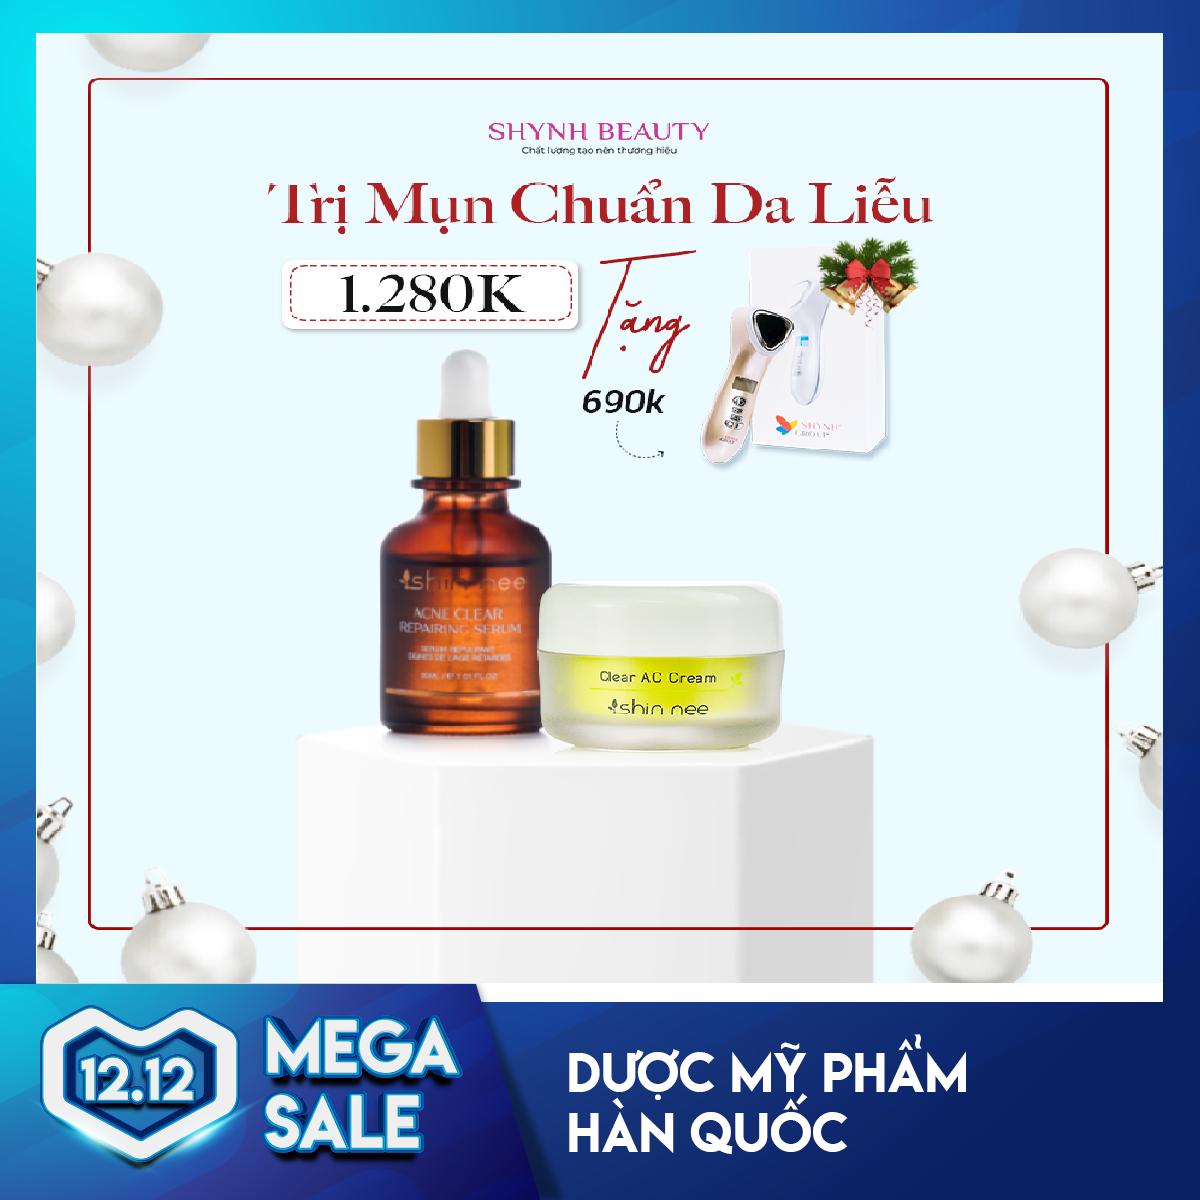 Combo Trị Mụn Chuẩn Da Liễu gồm Serum Acne Repairing + Kem Trị Mụn ShinNee Clear Acne Cream (Tặng Voucher Giảm 20%)